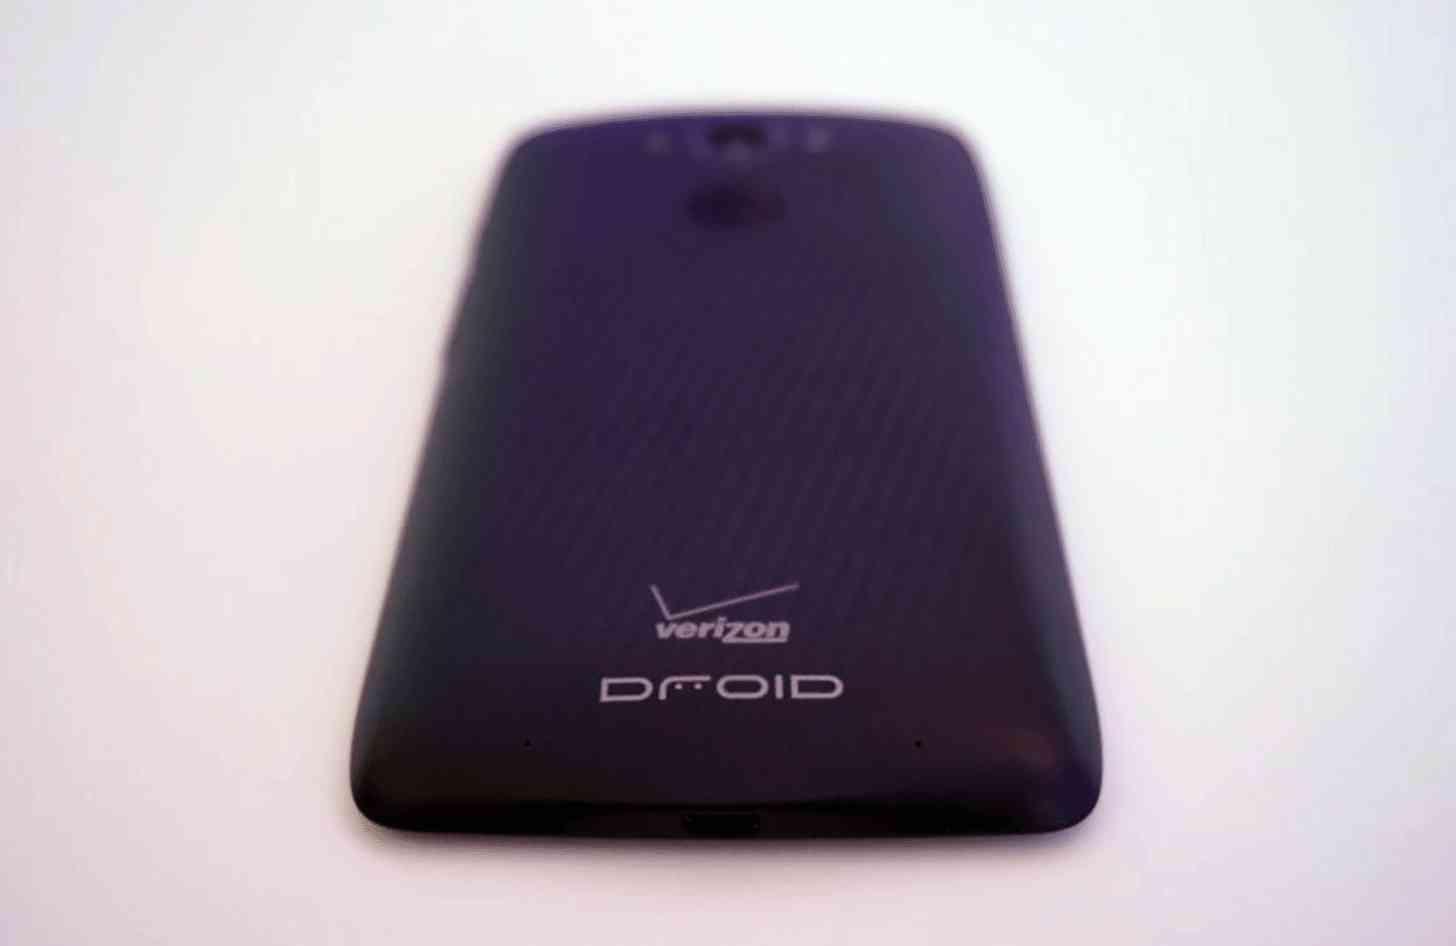 Motorola DROID Turbo rear large